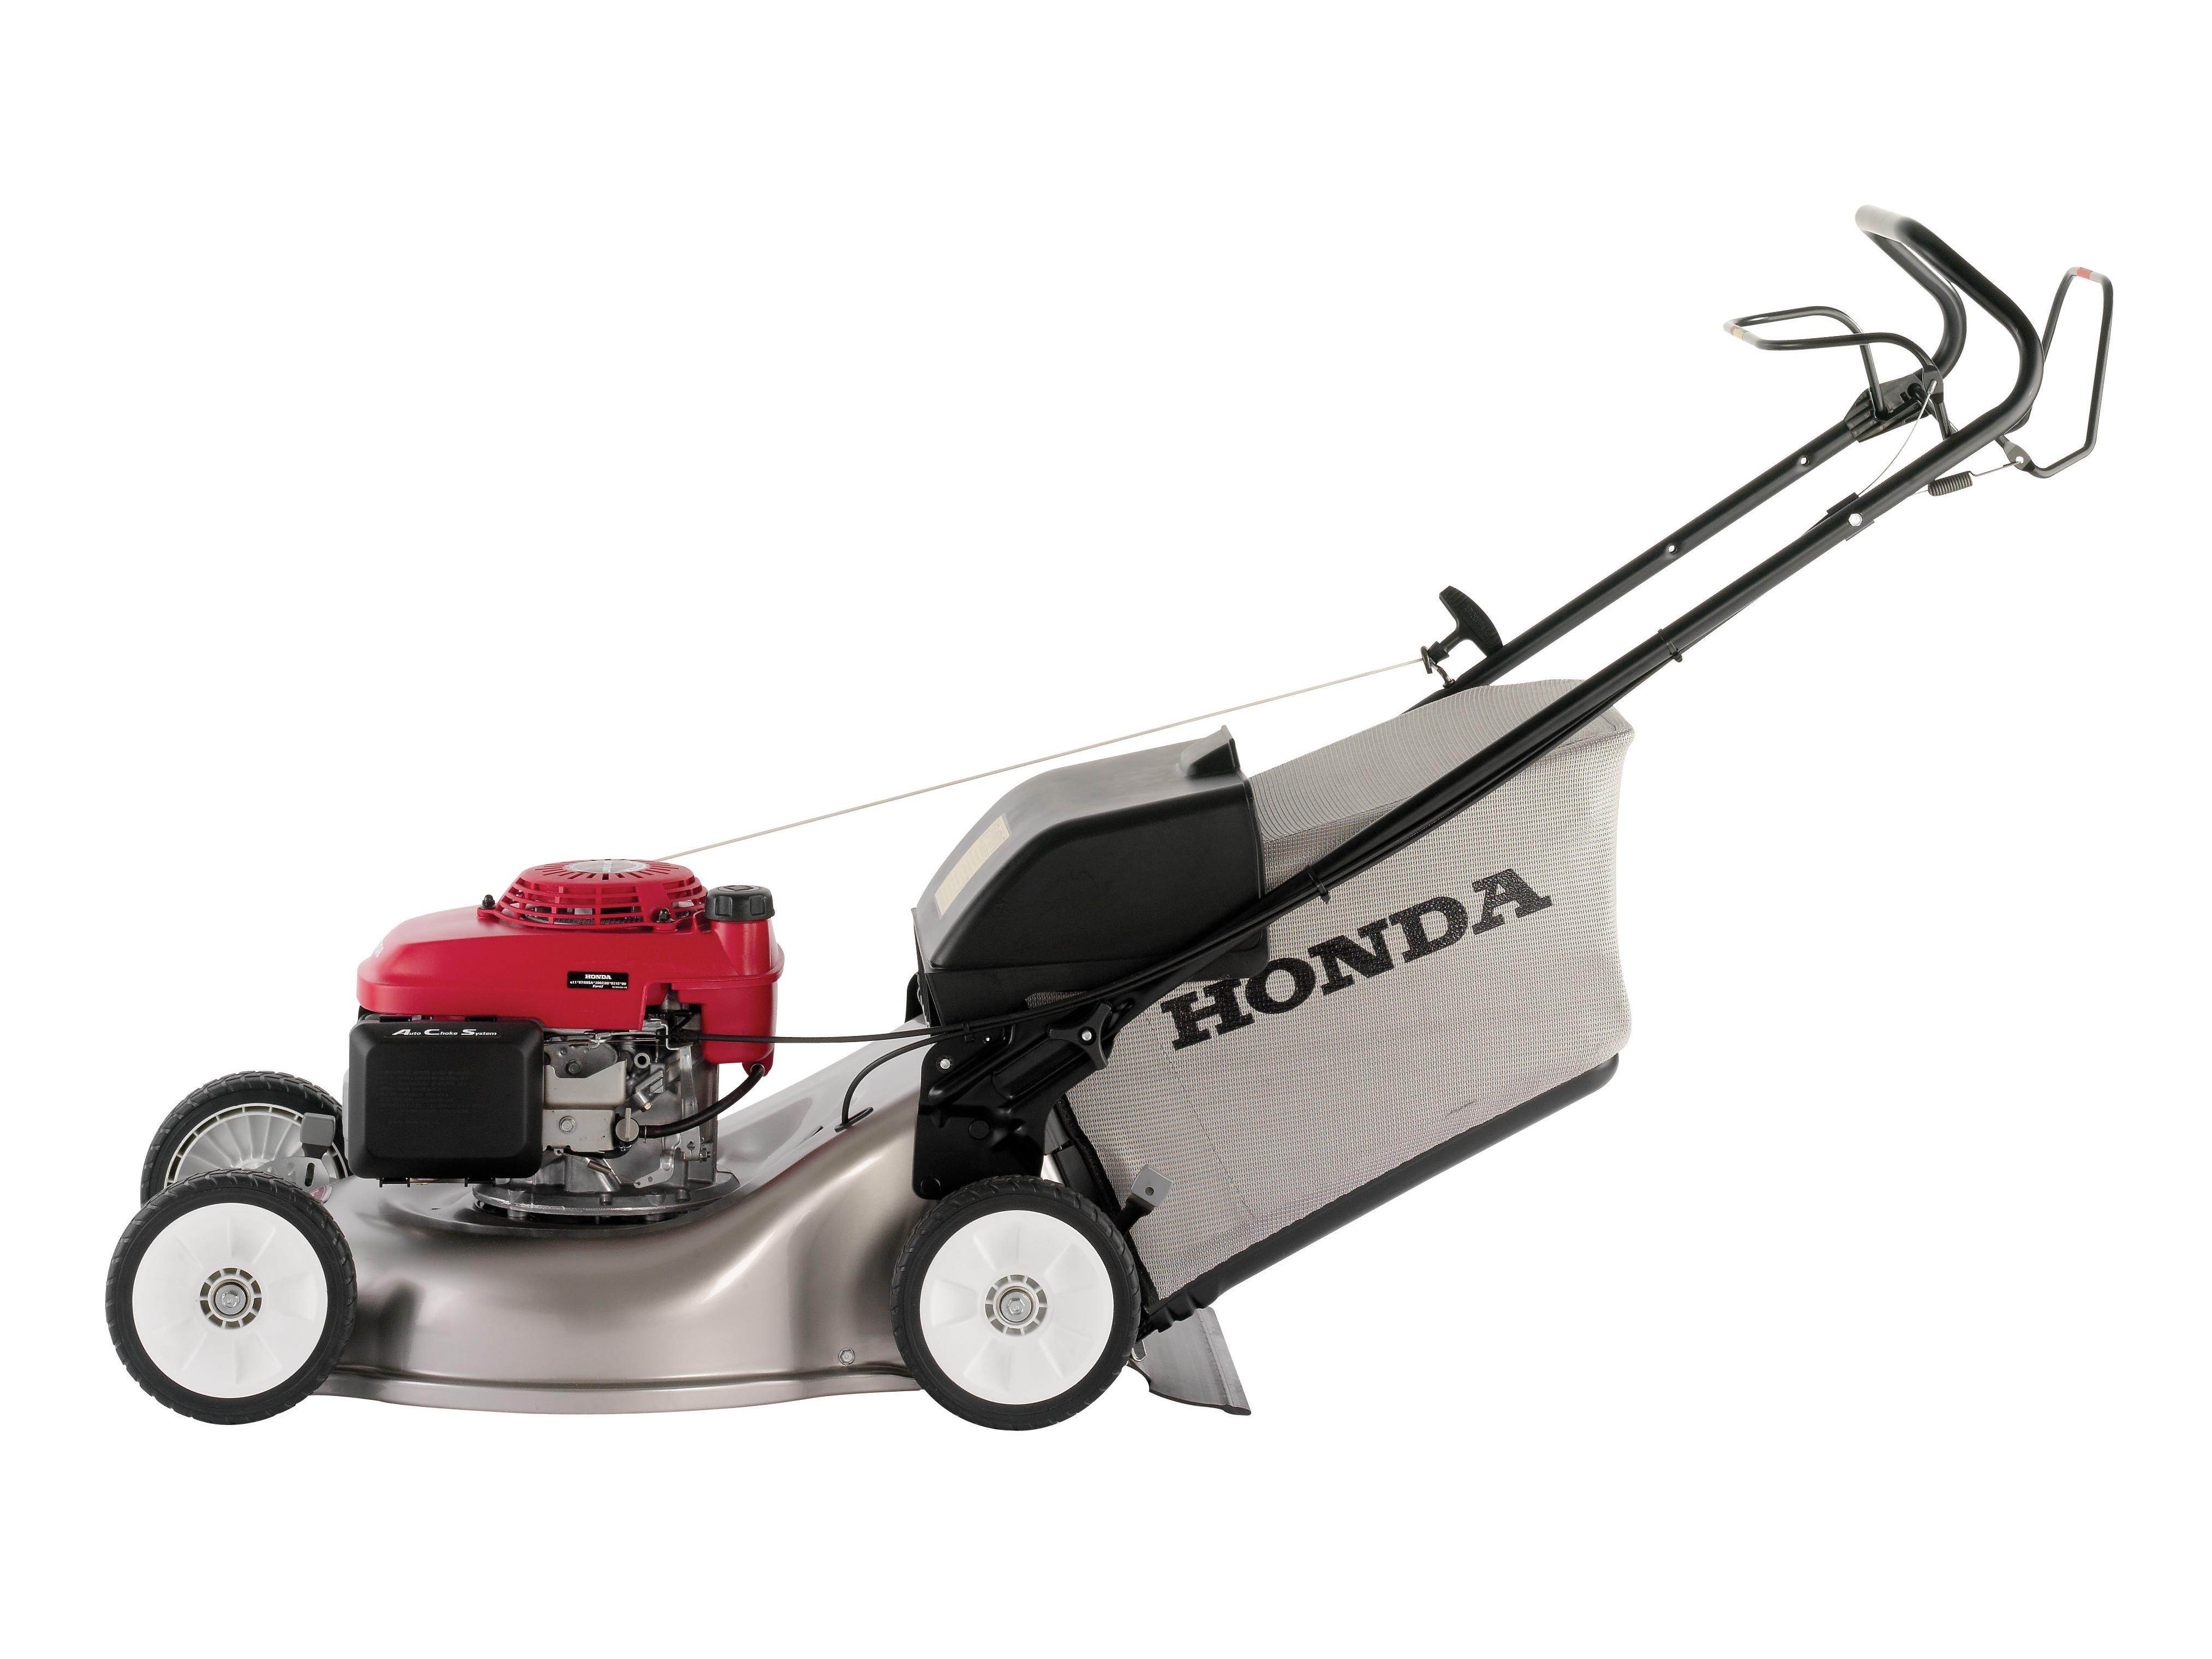 Honda HRG536VYE ruohonleikkuri